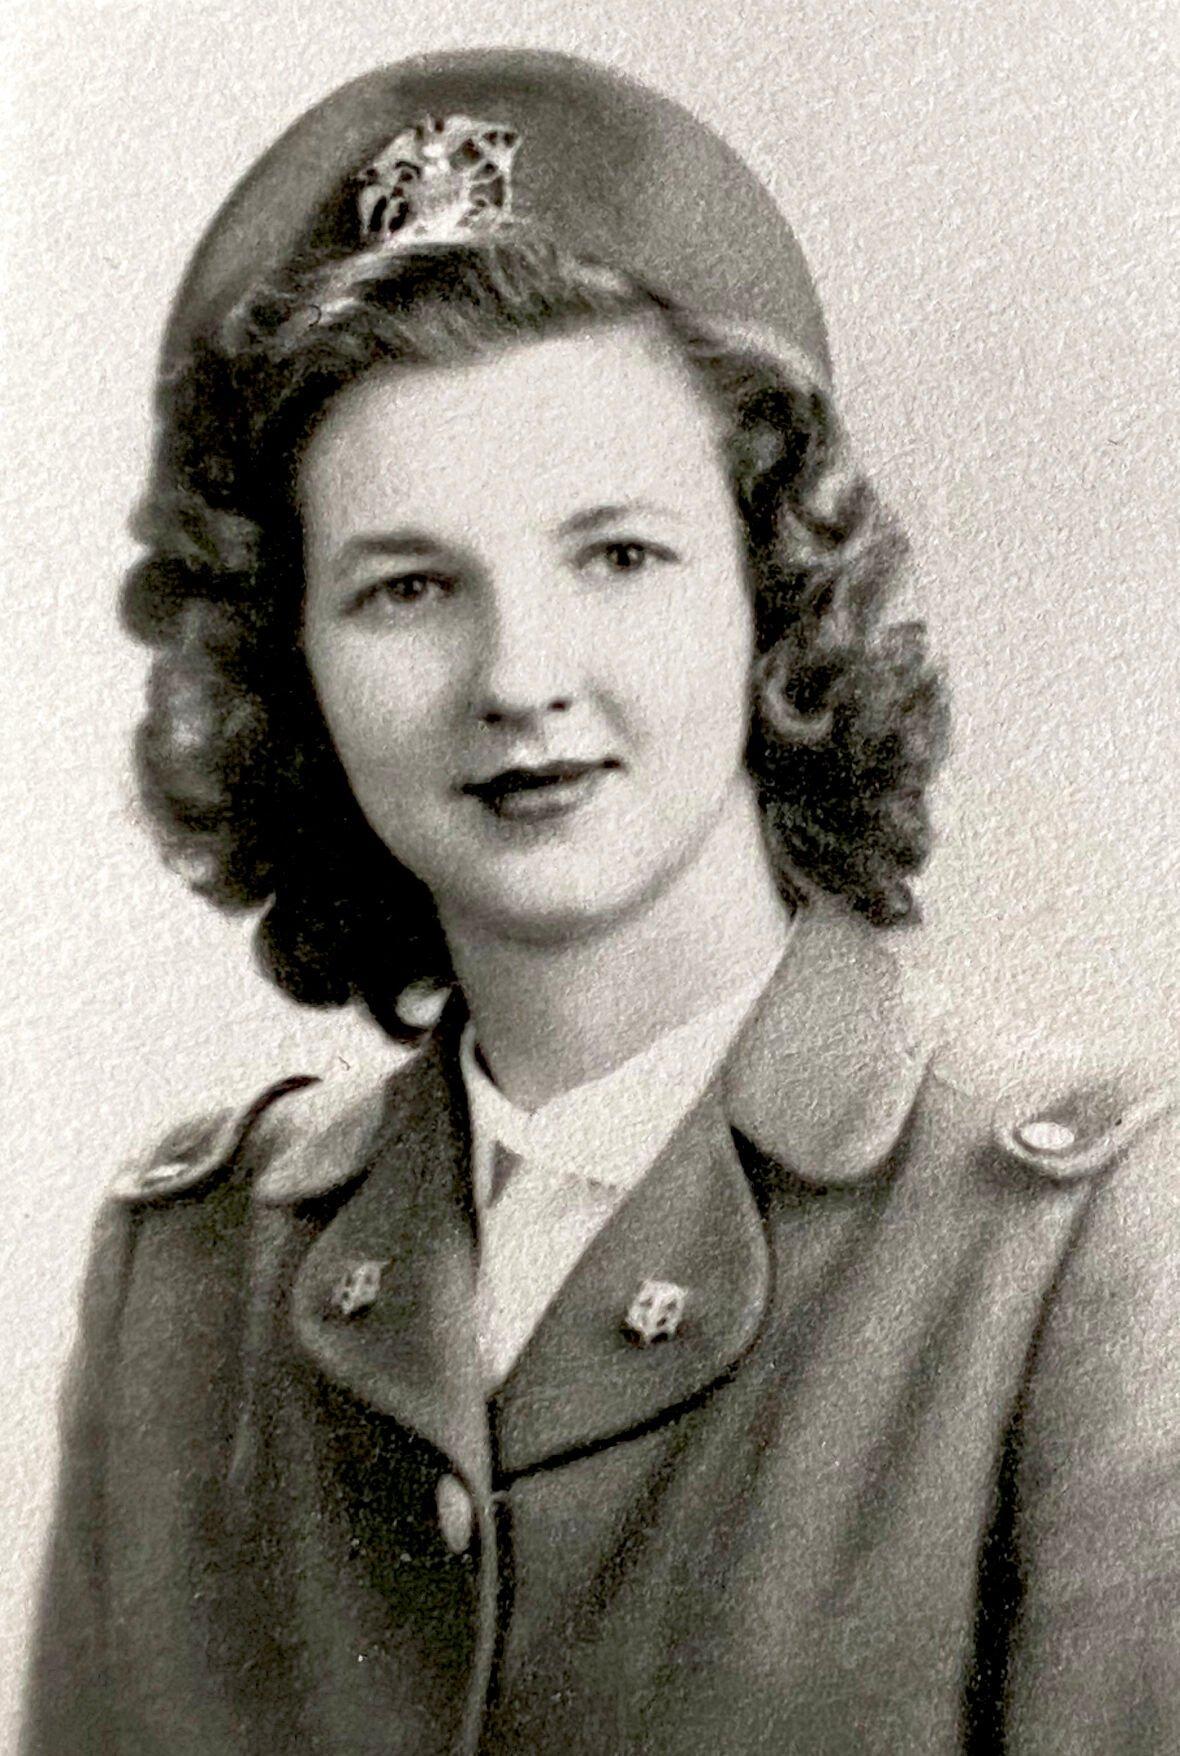 WWII Cadet Nurse Barbara Lincoln